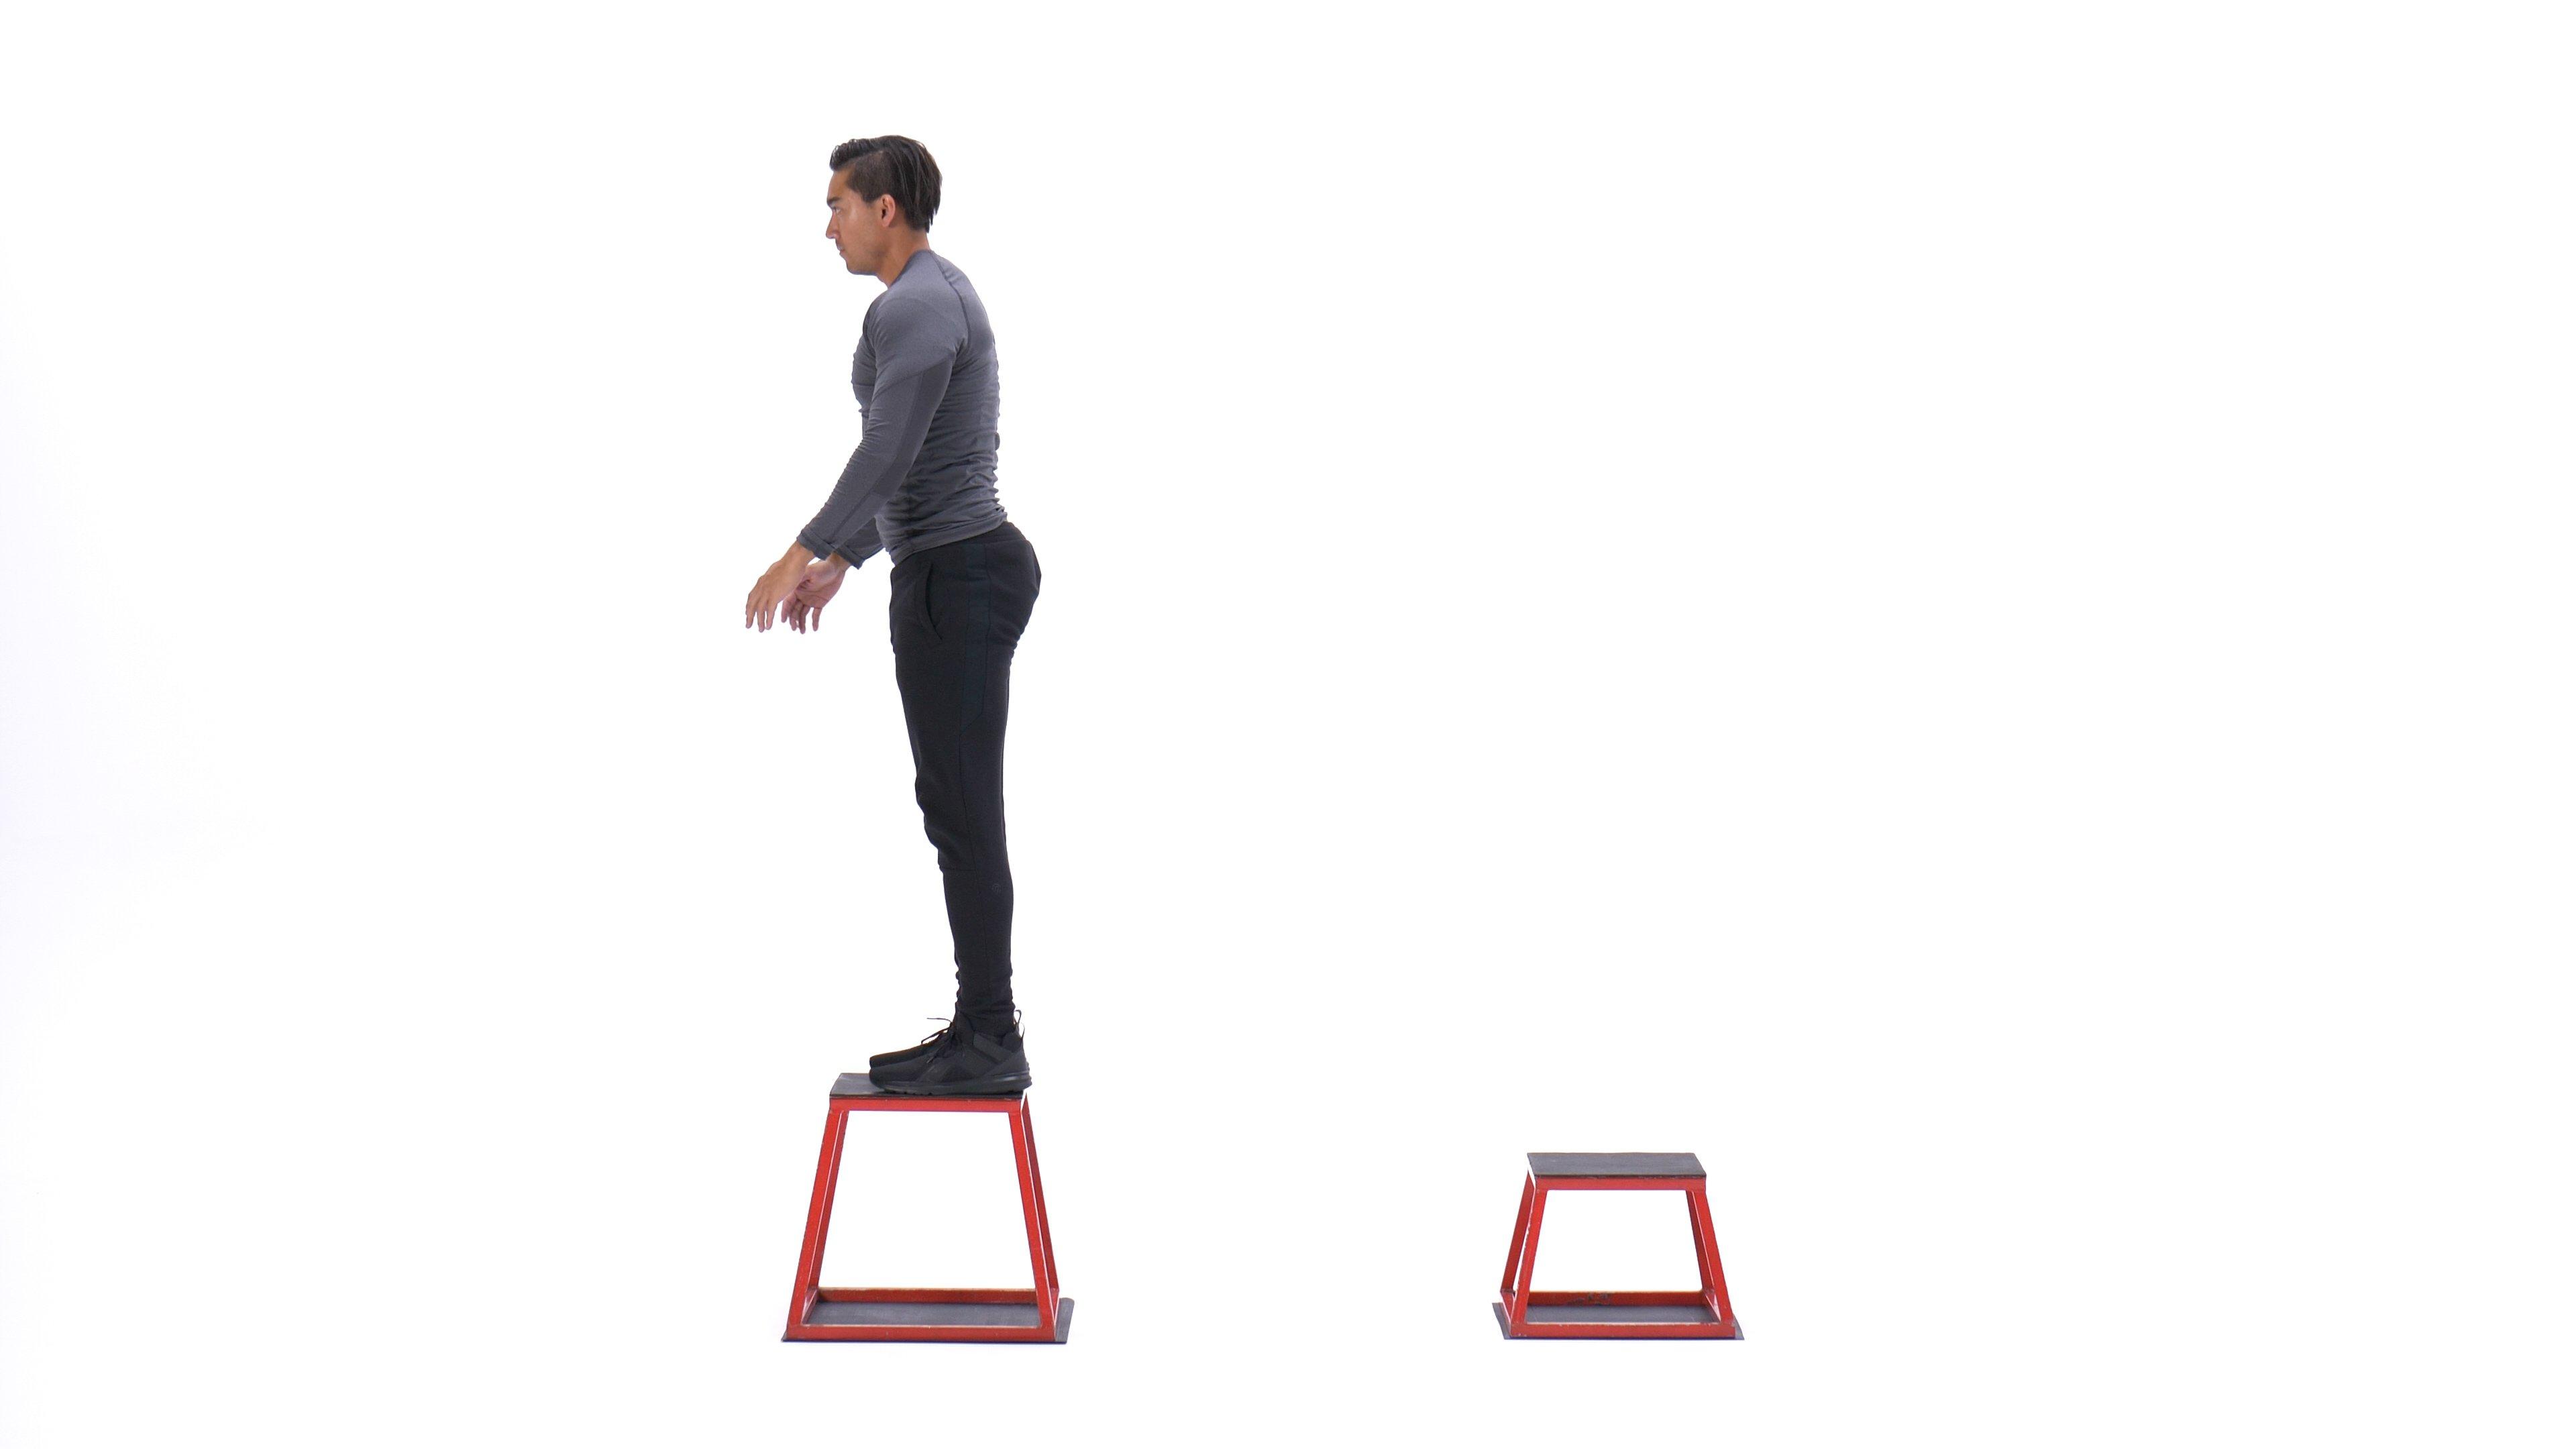 Depth jump box jump image